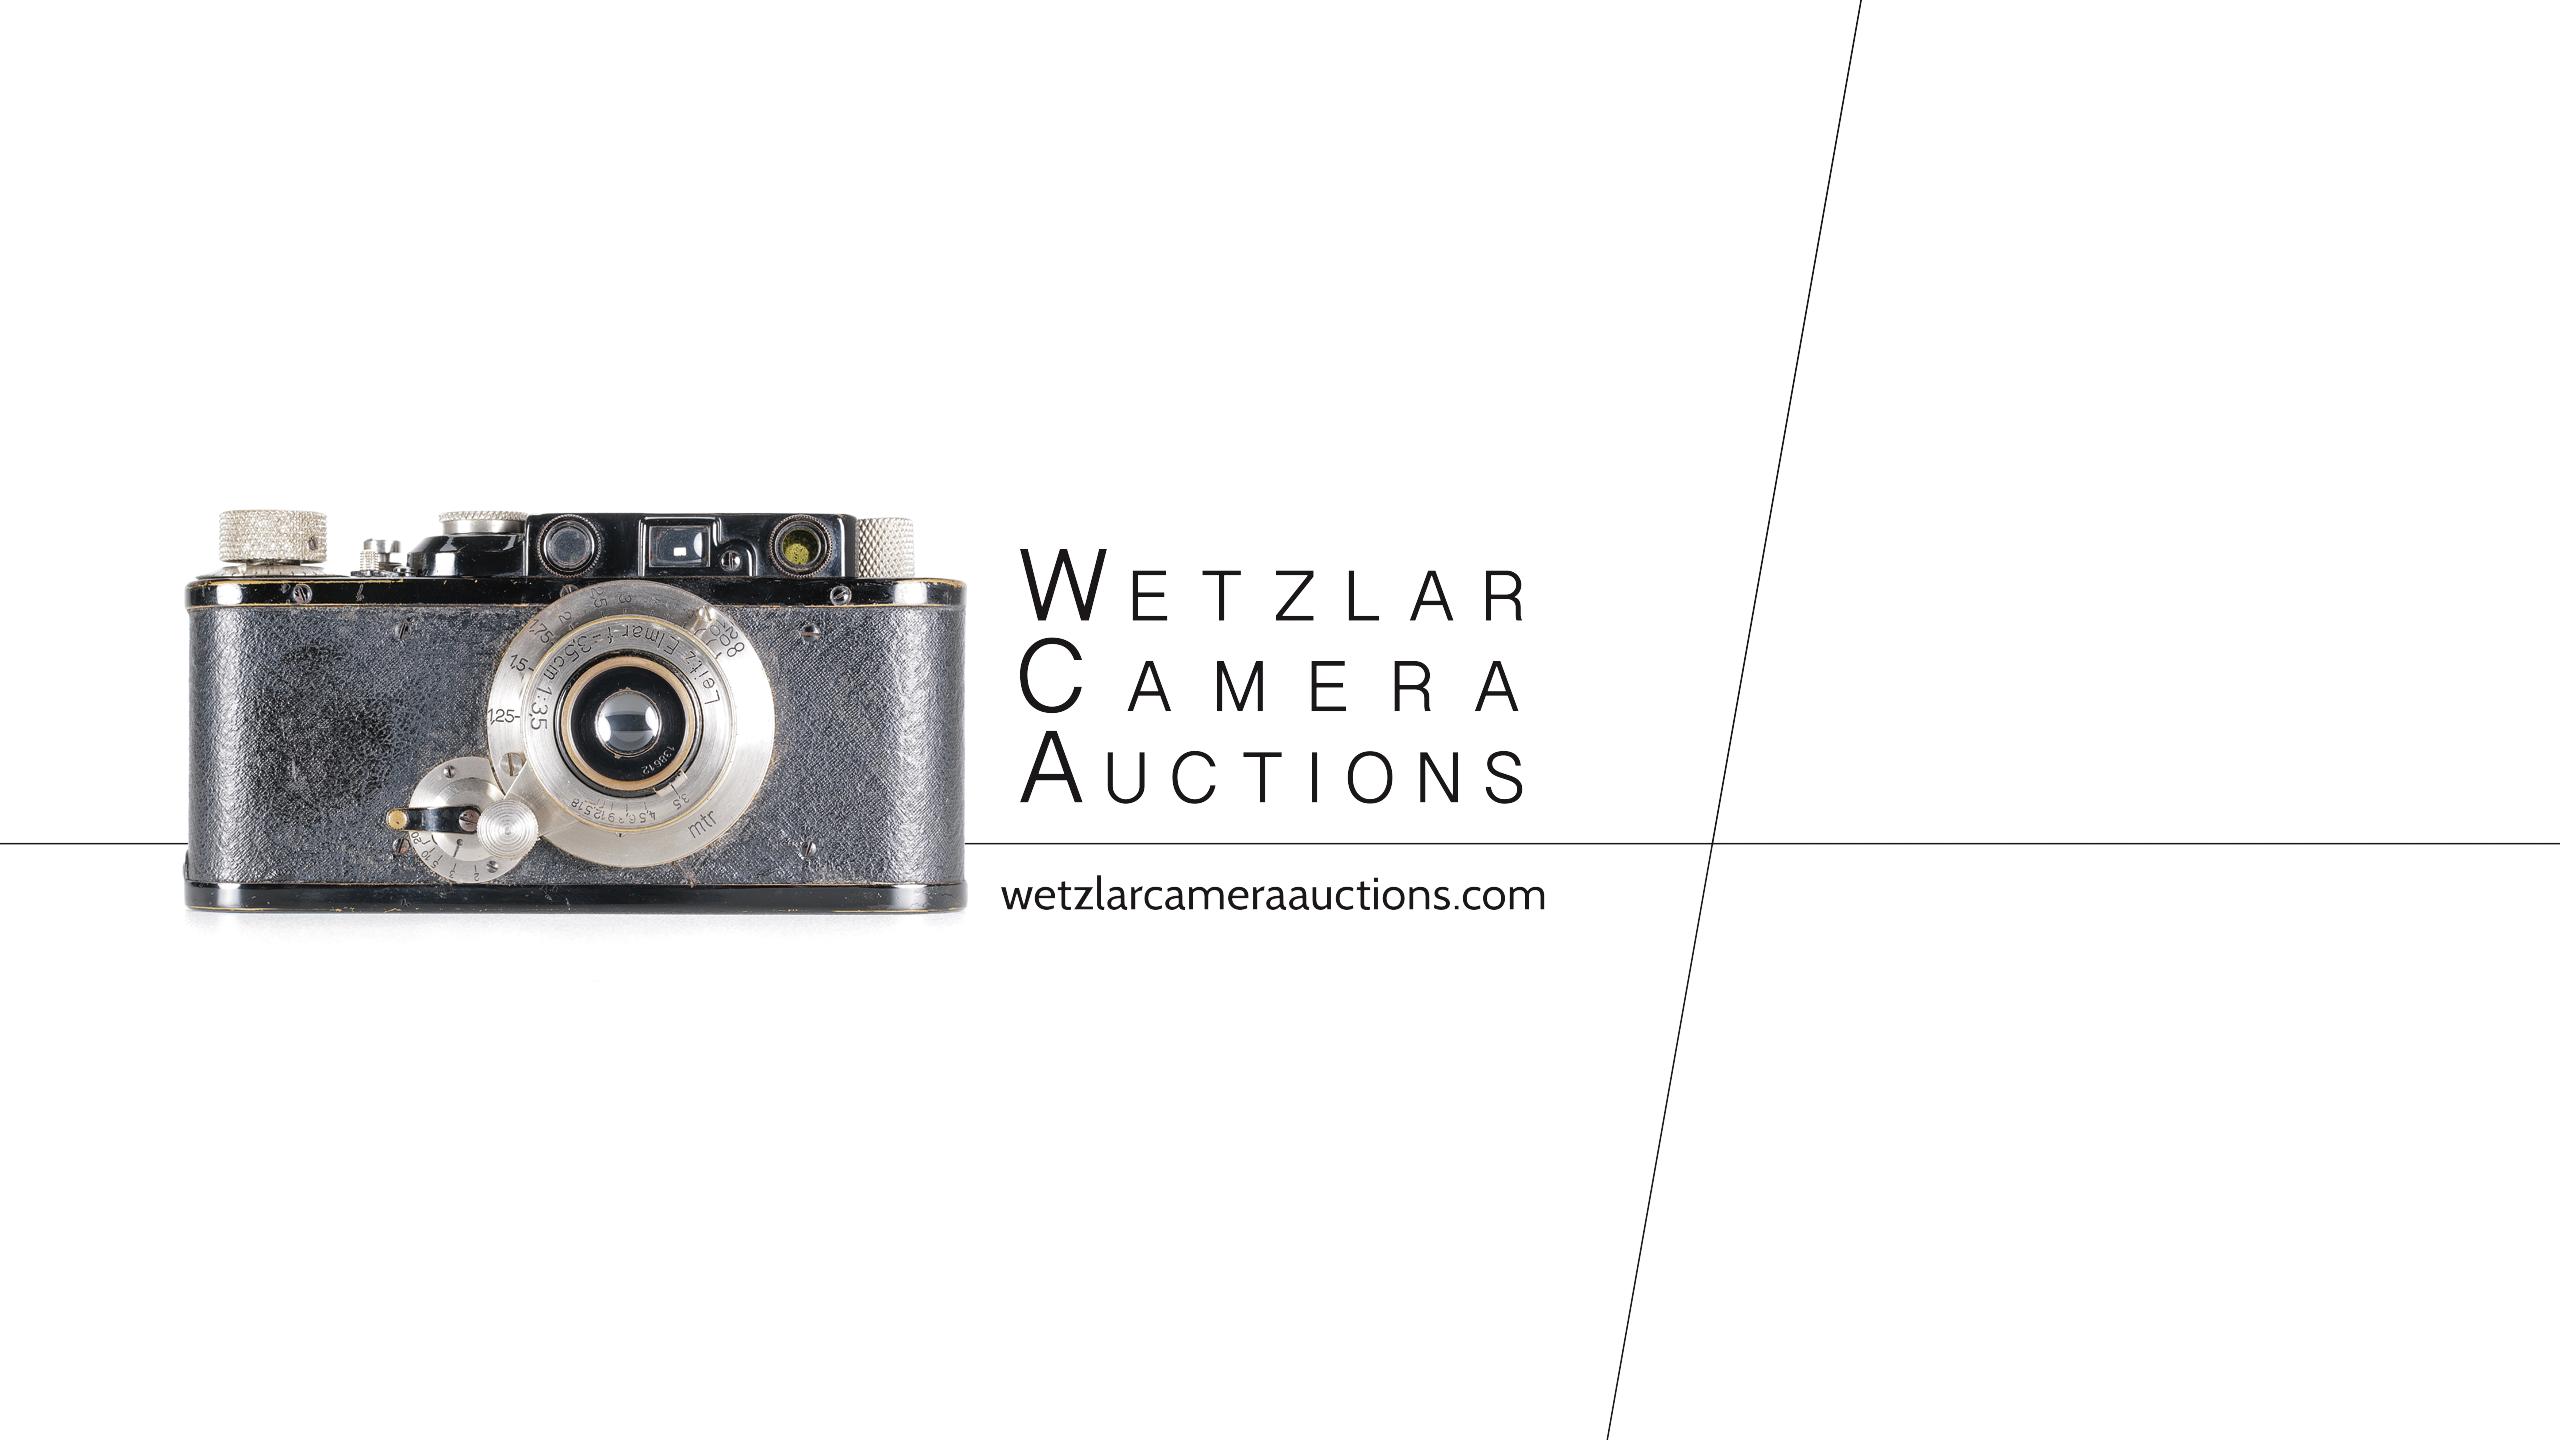 Wetzlar Camera Auctions - Leica III (Model F) Prototype - October 09th 2021